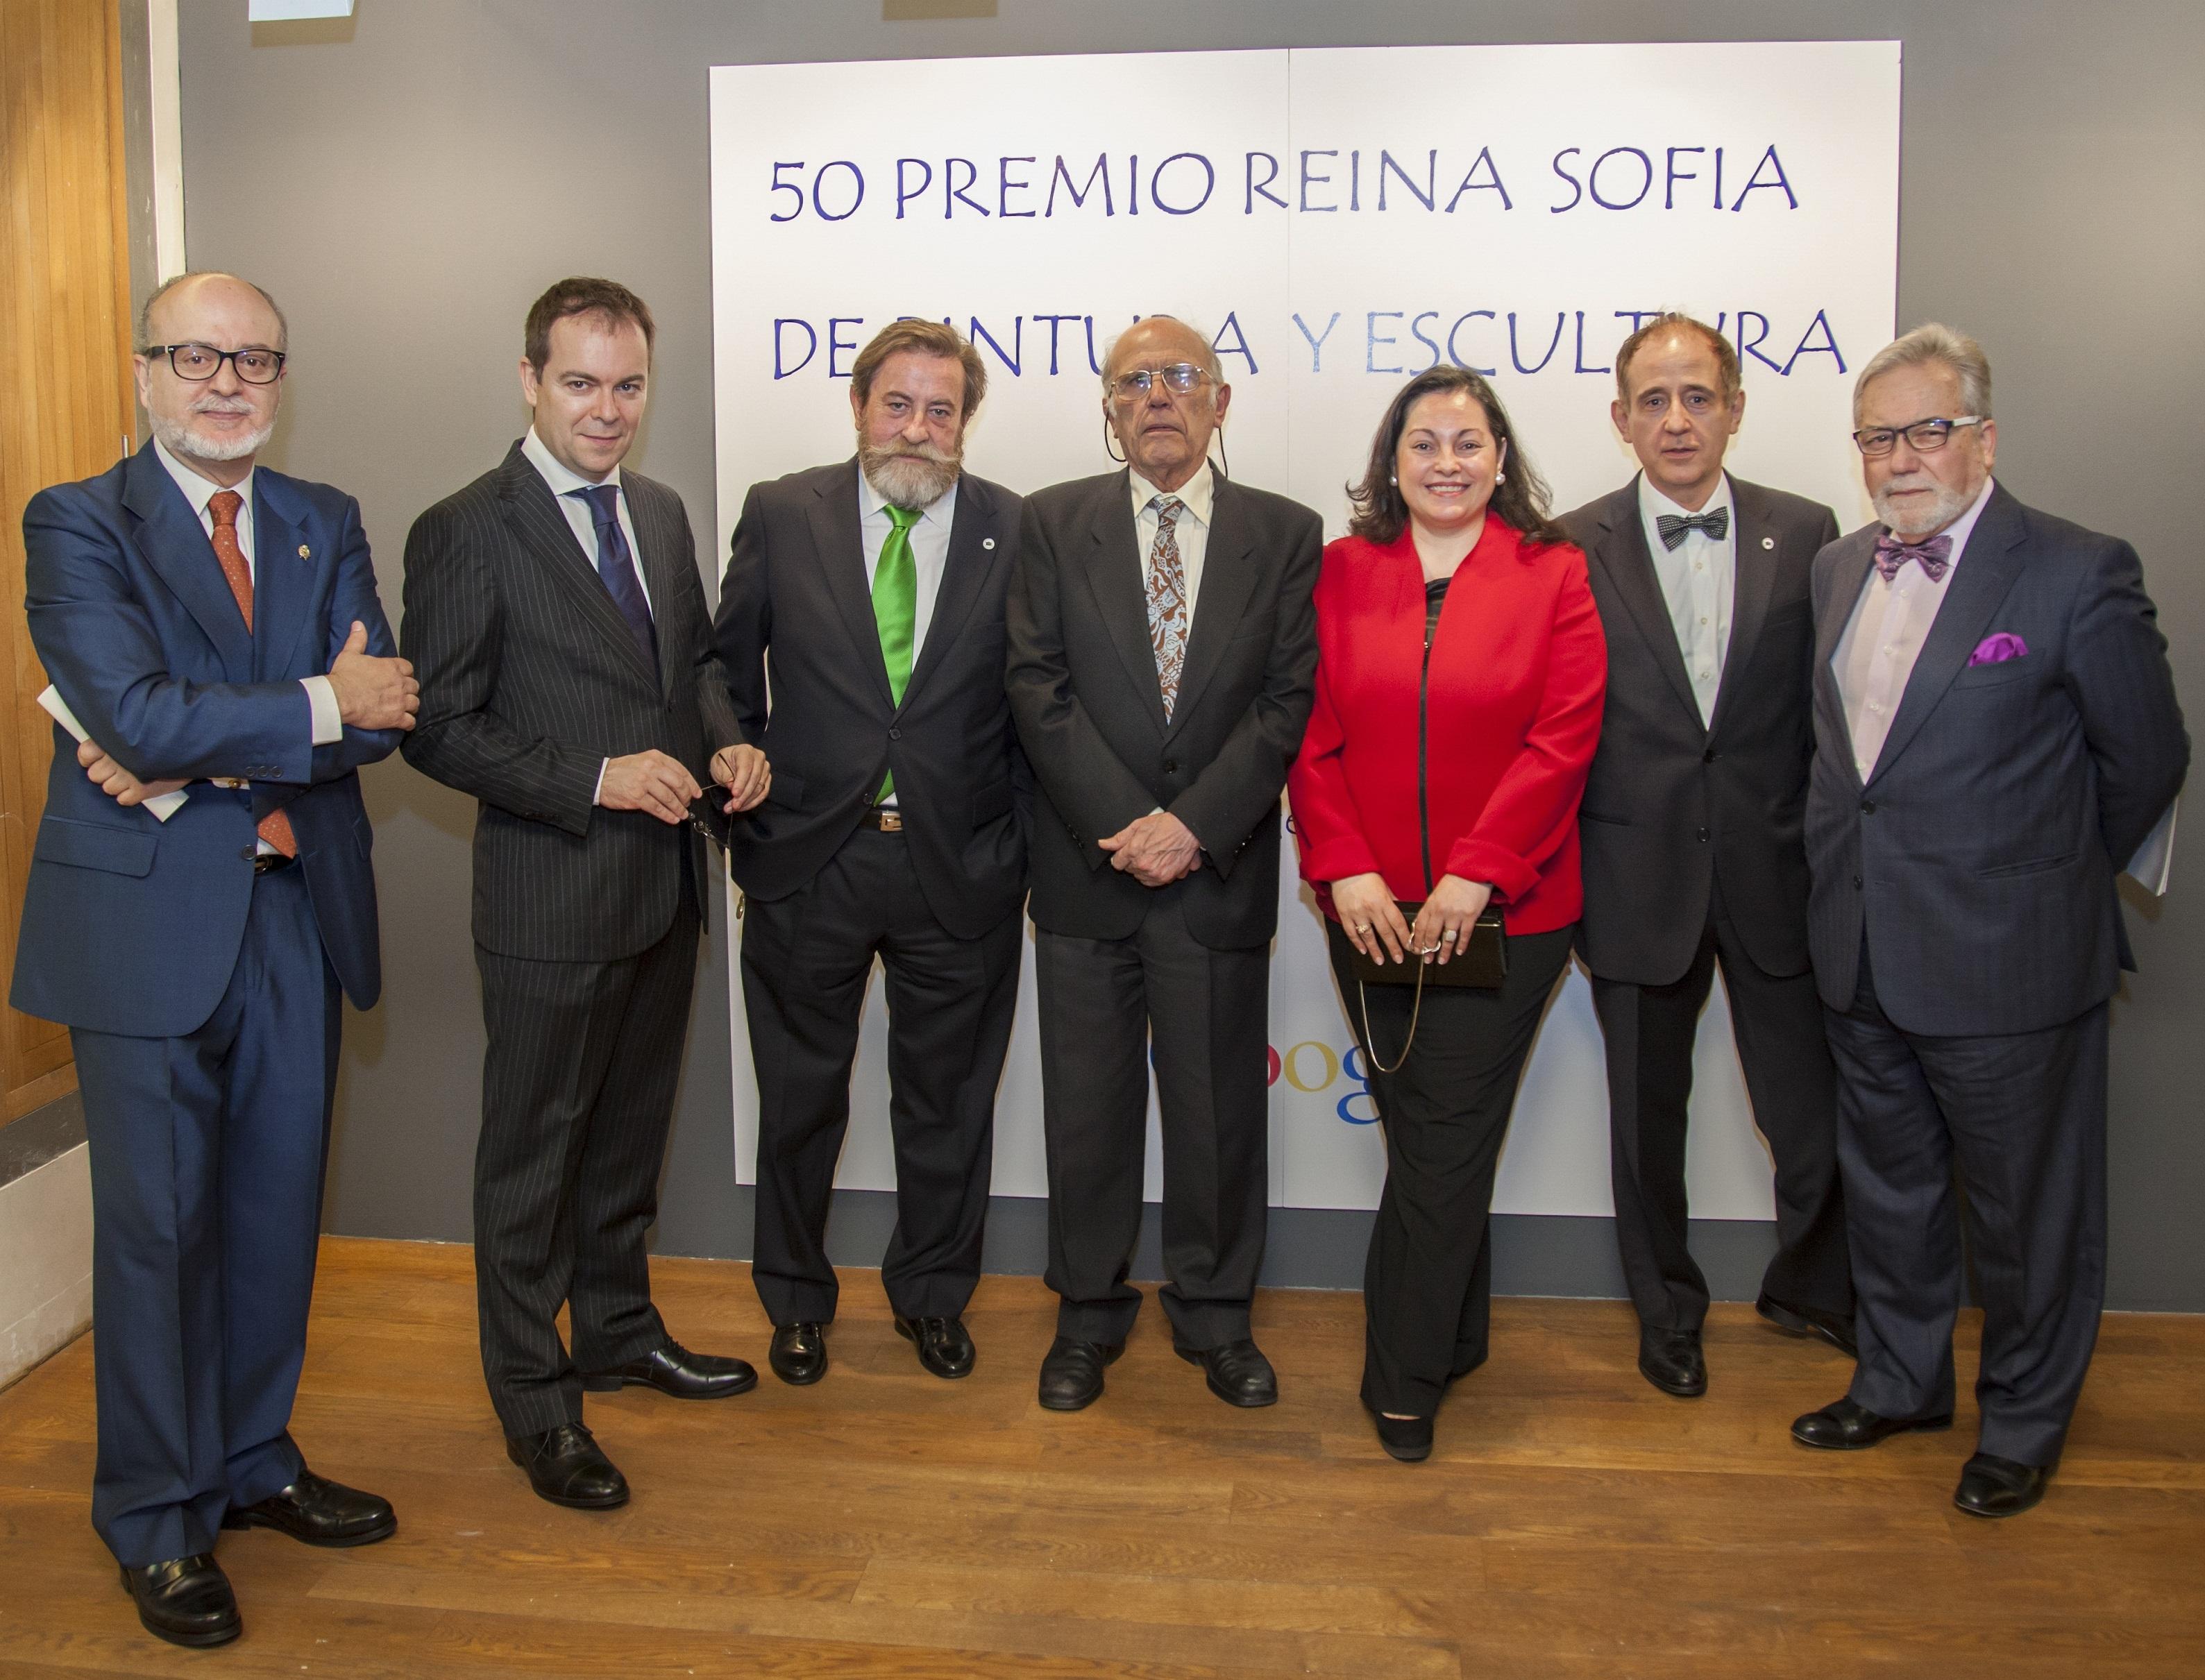 alexjimenez.es_PremioReinaSofía2015_00066